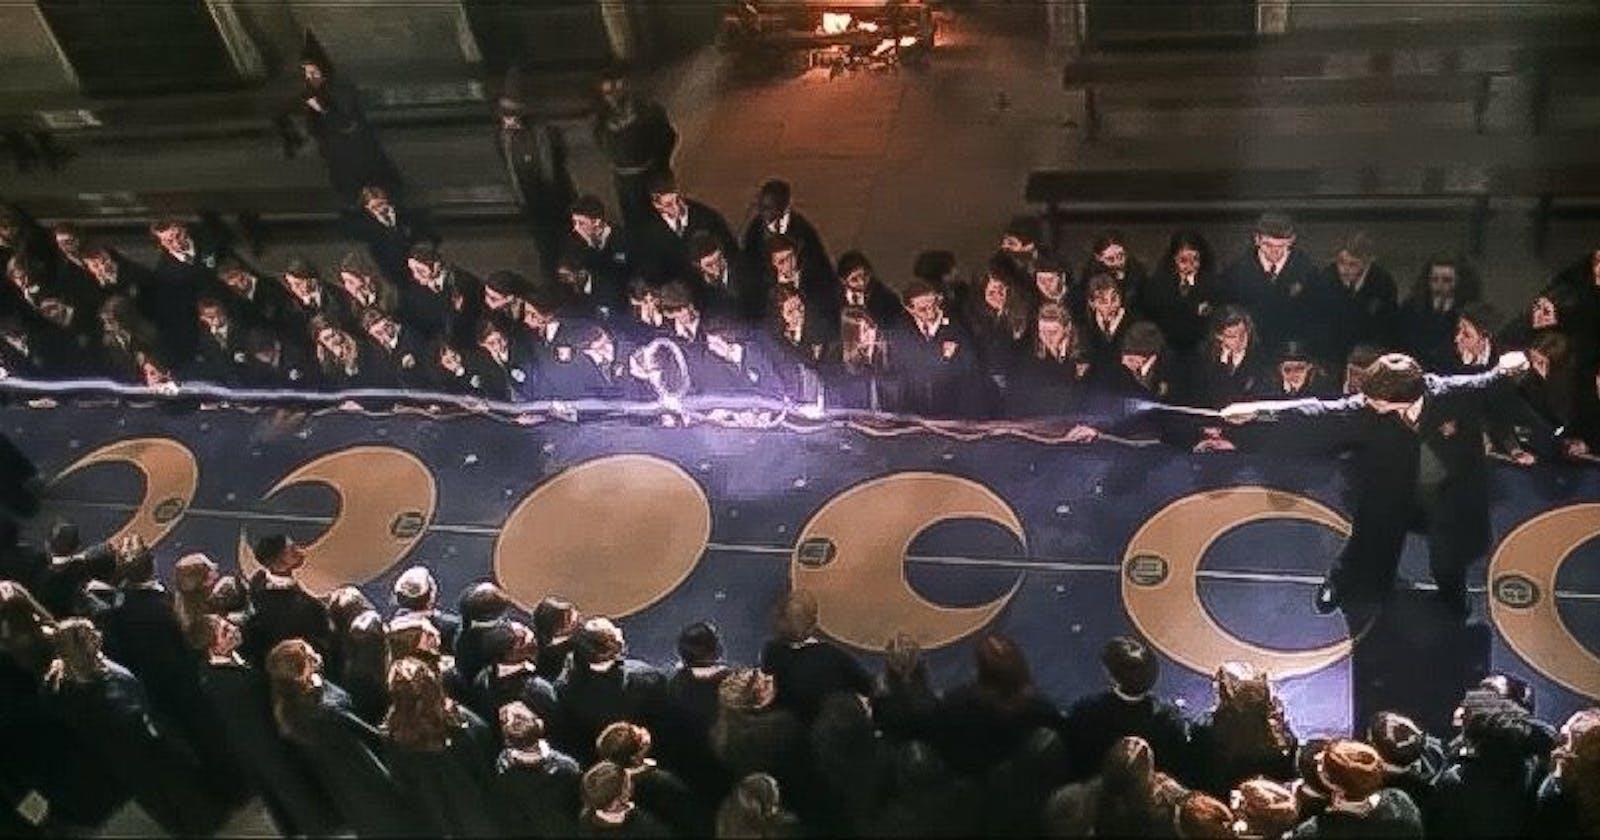 All Sorts of Sorting Sorcery...